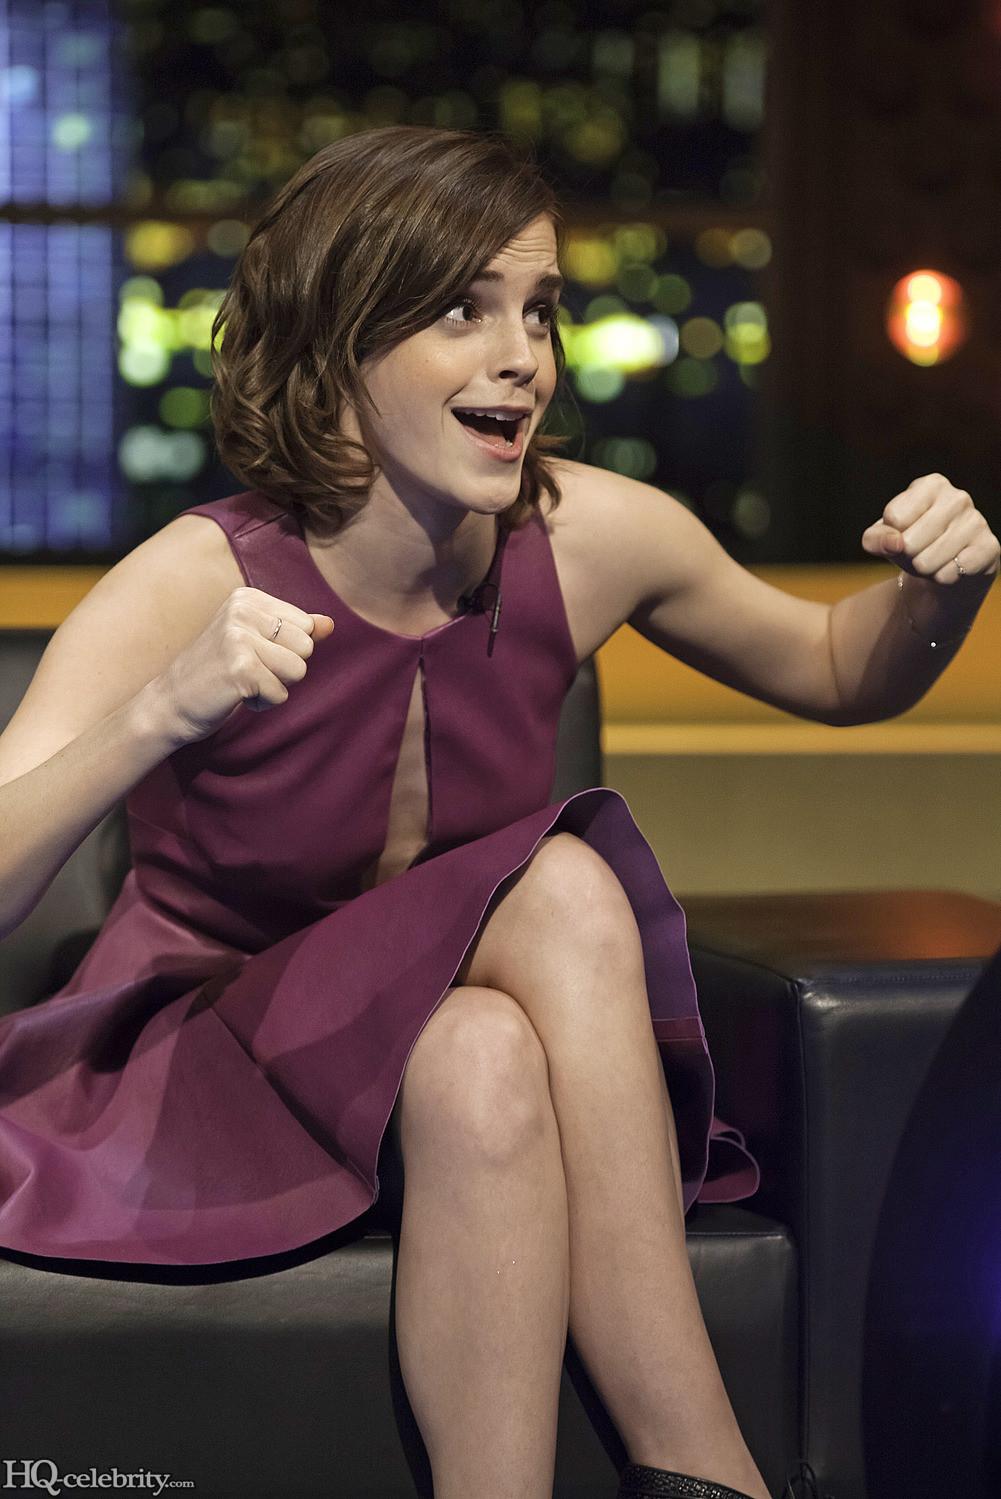 Emma Watson Has A Blast On The Jonathan Ross Show AdkbDyFj